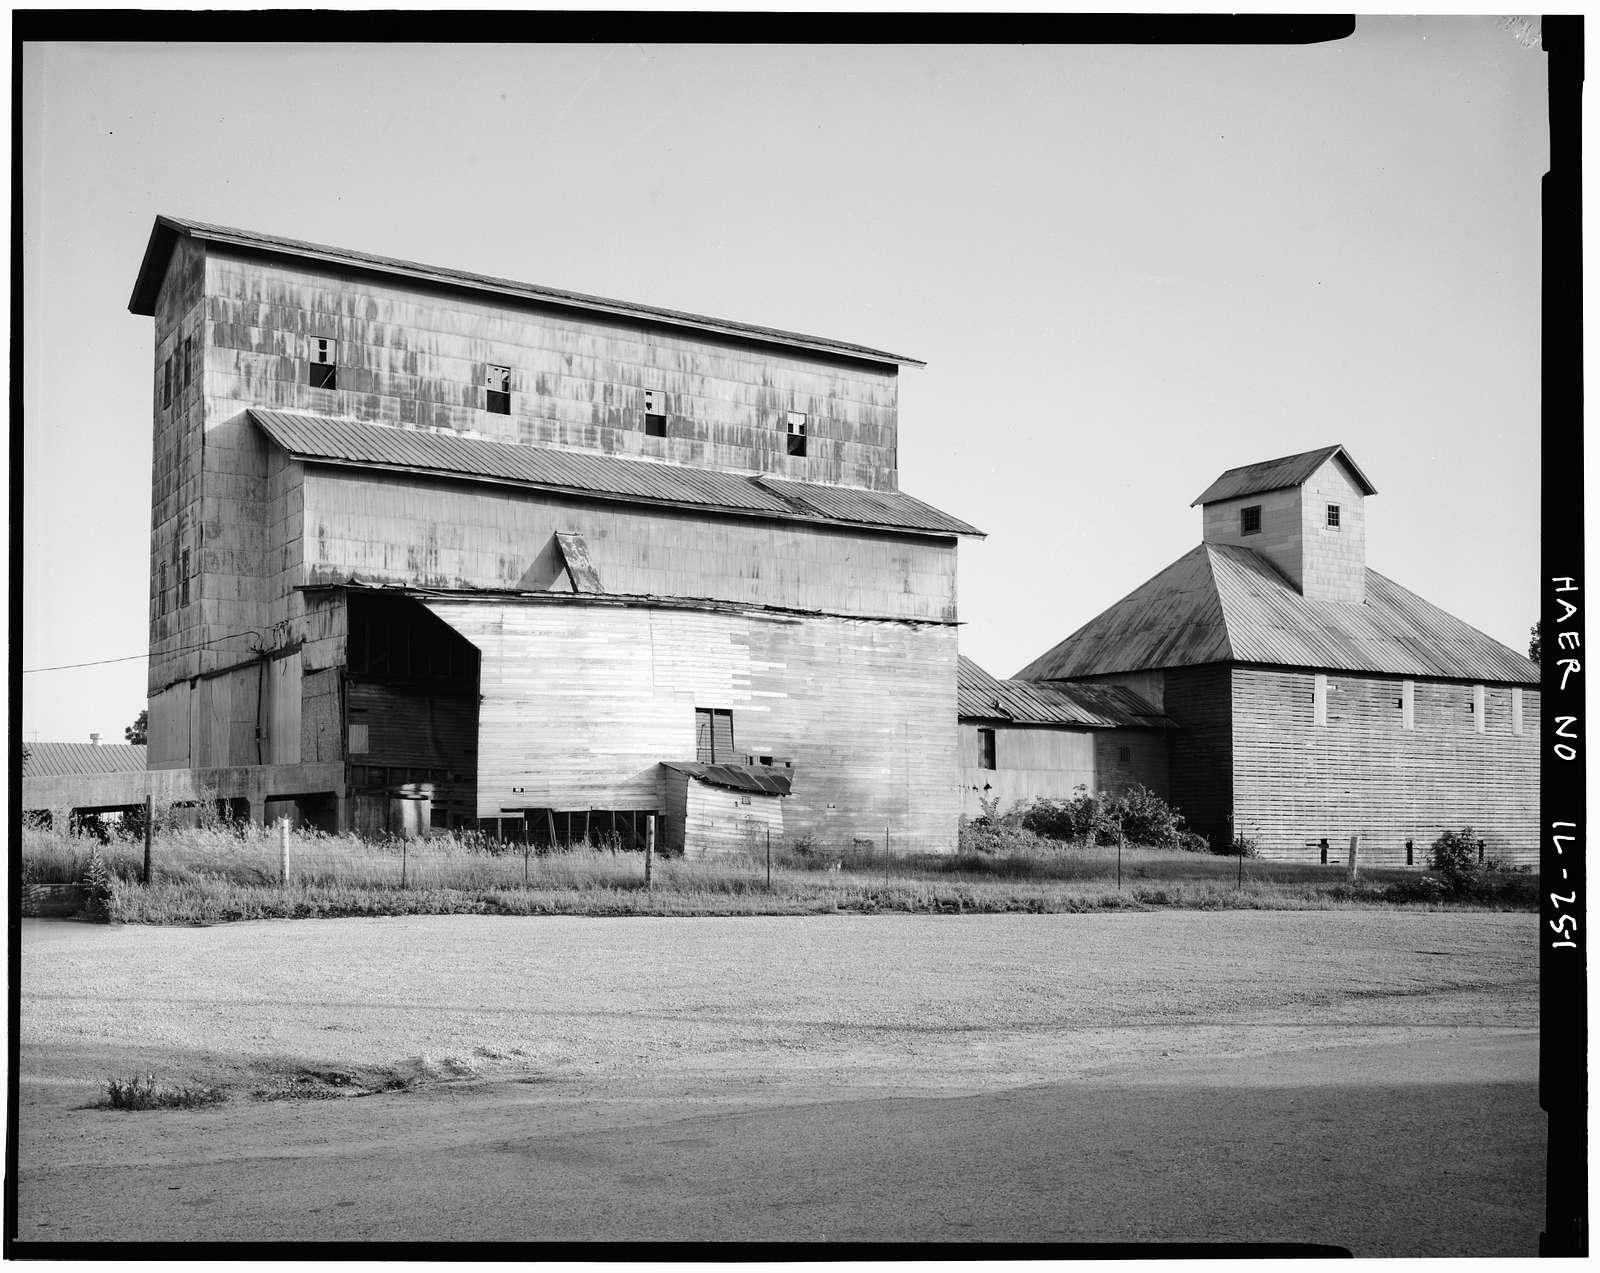 Armour's Warehouse, Williams Street, Seneca, La Salle County, IL